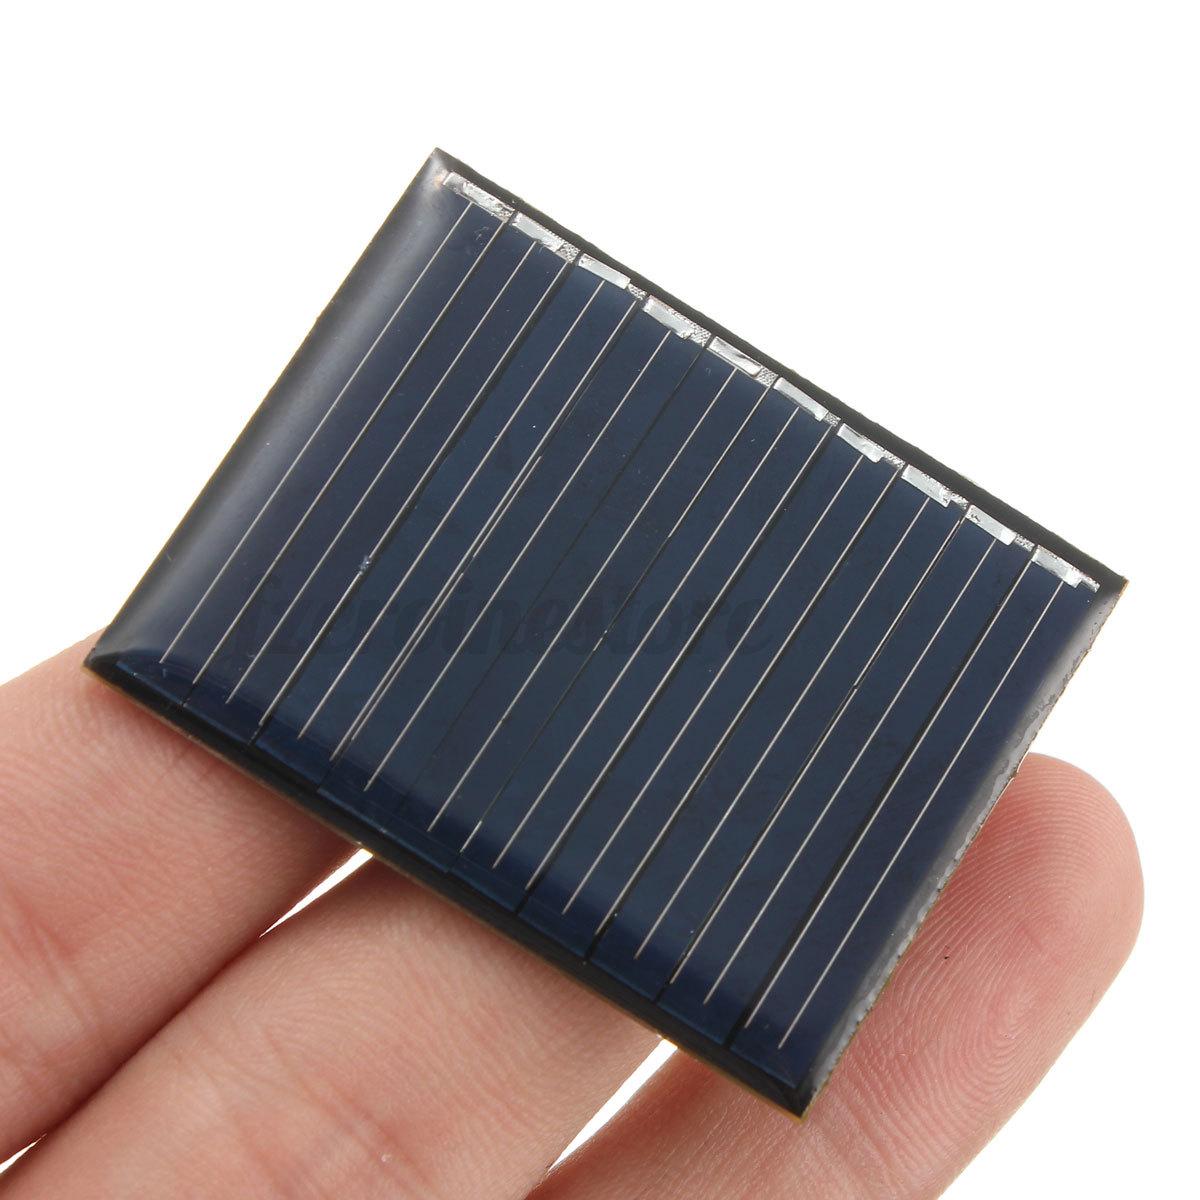 1 3 5 4 5 6 9 12v mini solar panel module for light. Black Bedroom Furniture Sets. Home Design Ideas